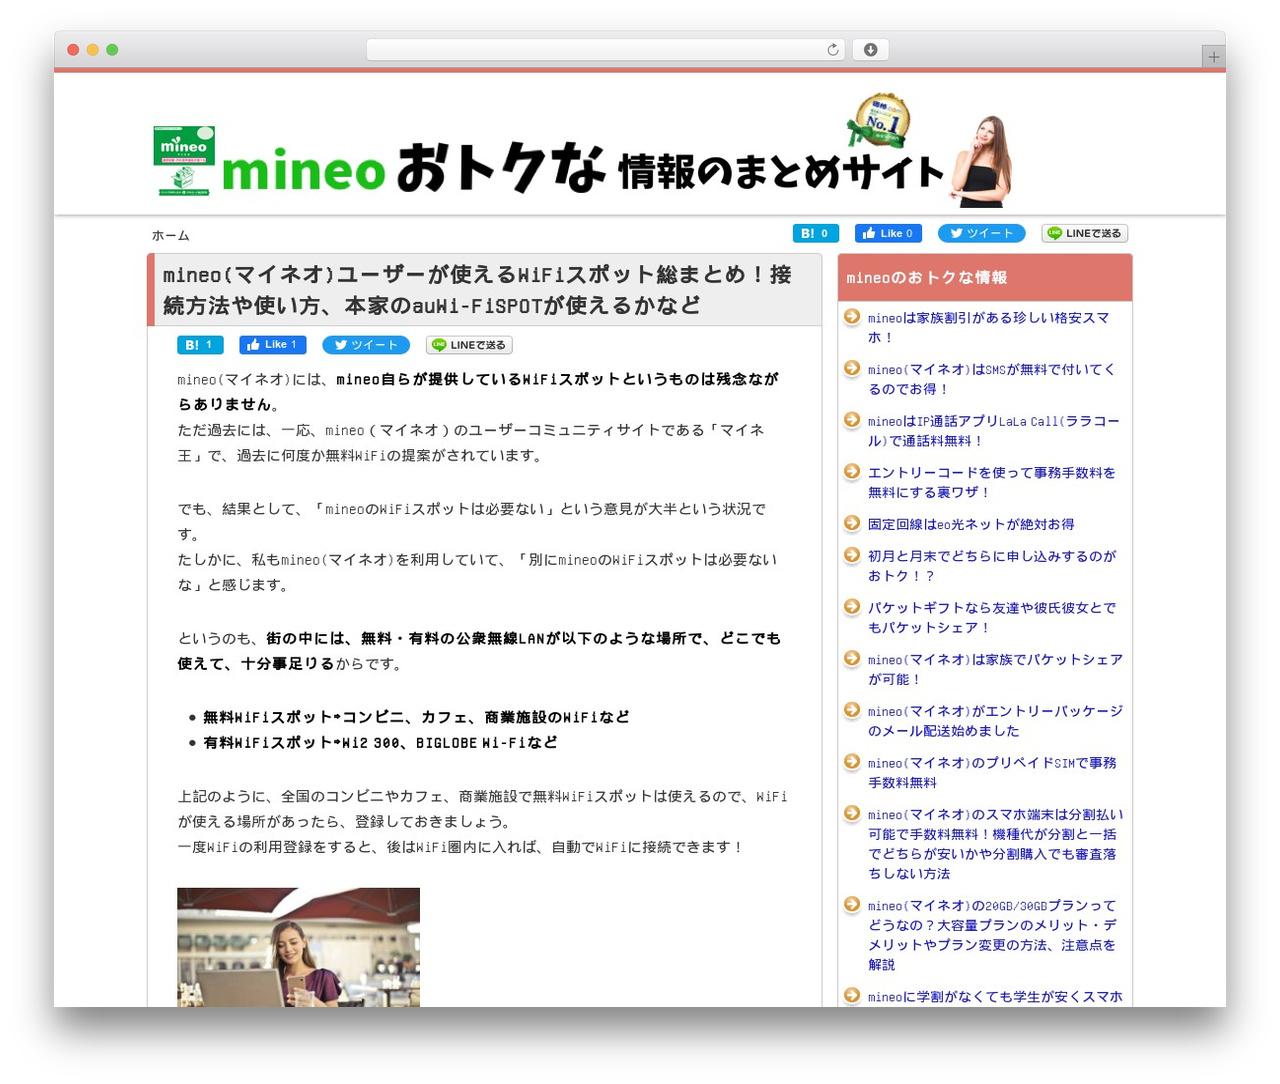 メシオプレス02 ver2 best WordPress theme - xn--t8j0jsa3l9c0331a12kbjc.xyz